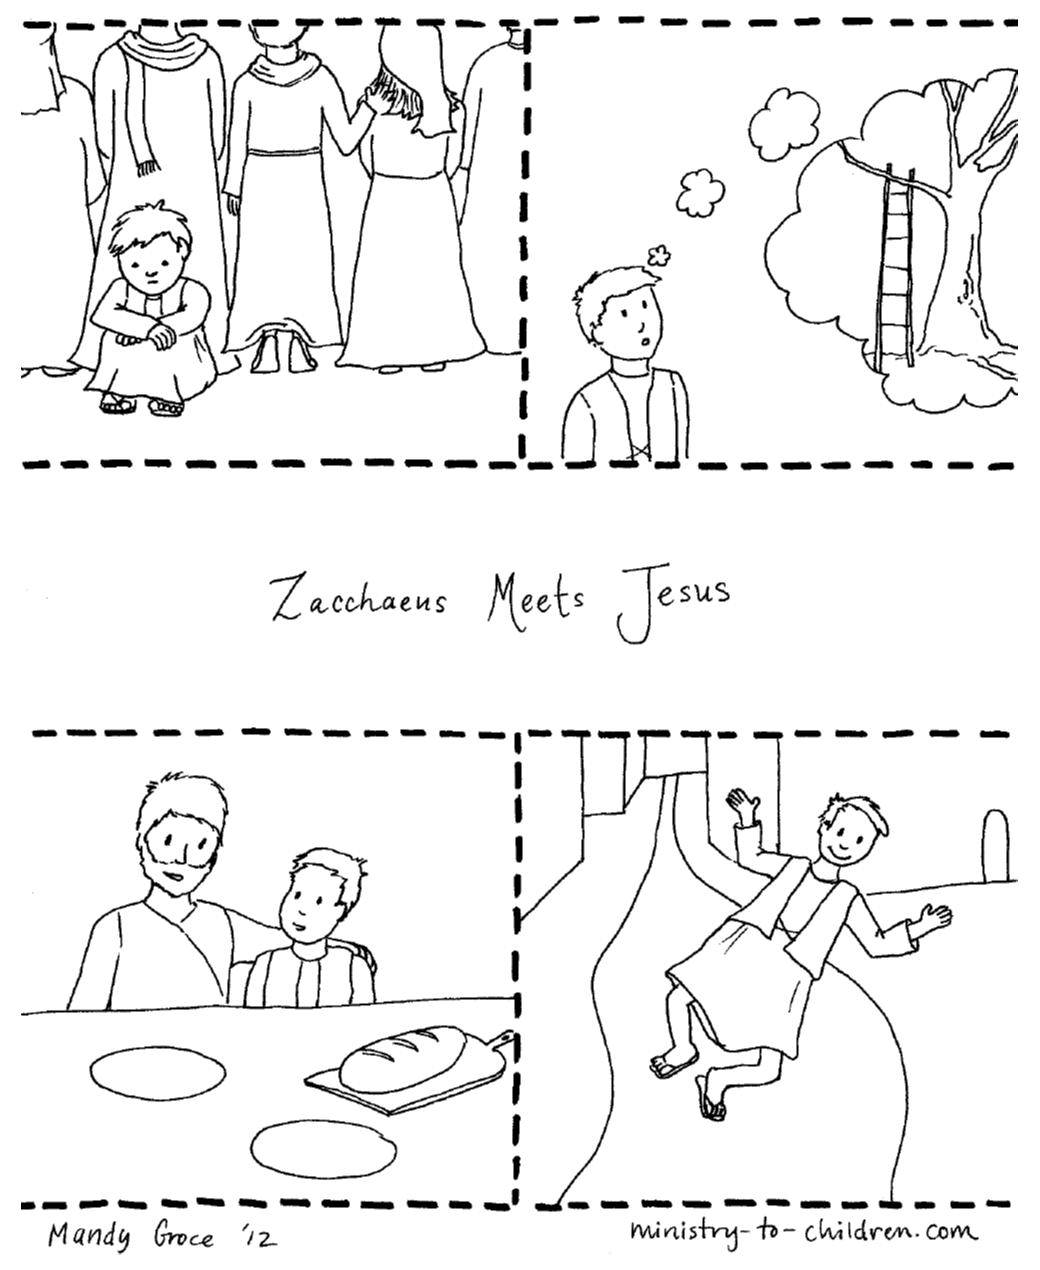 Coloring Pages Zaccheus Jesus And Zacchaeus Coloring Page